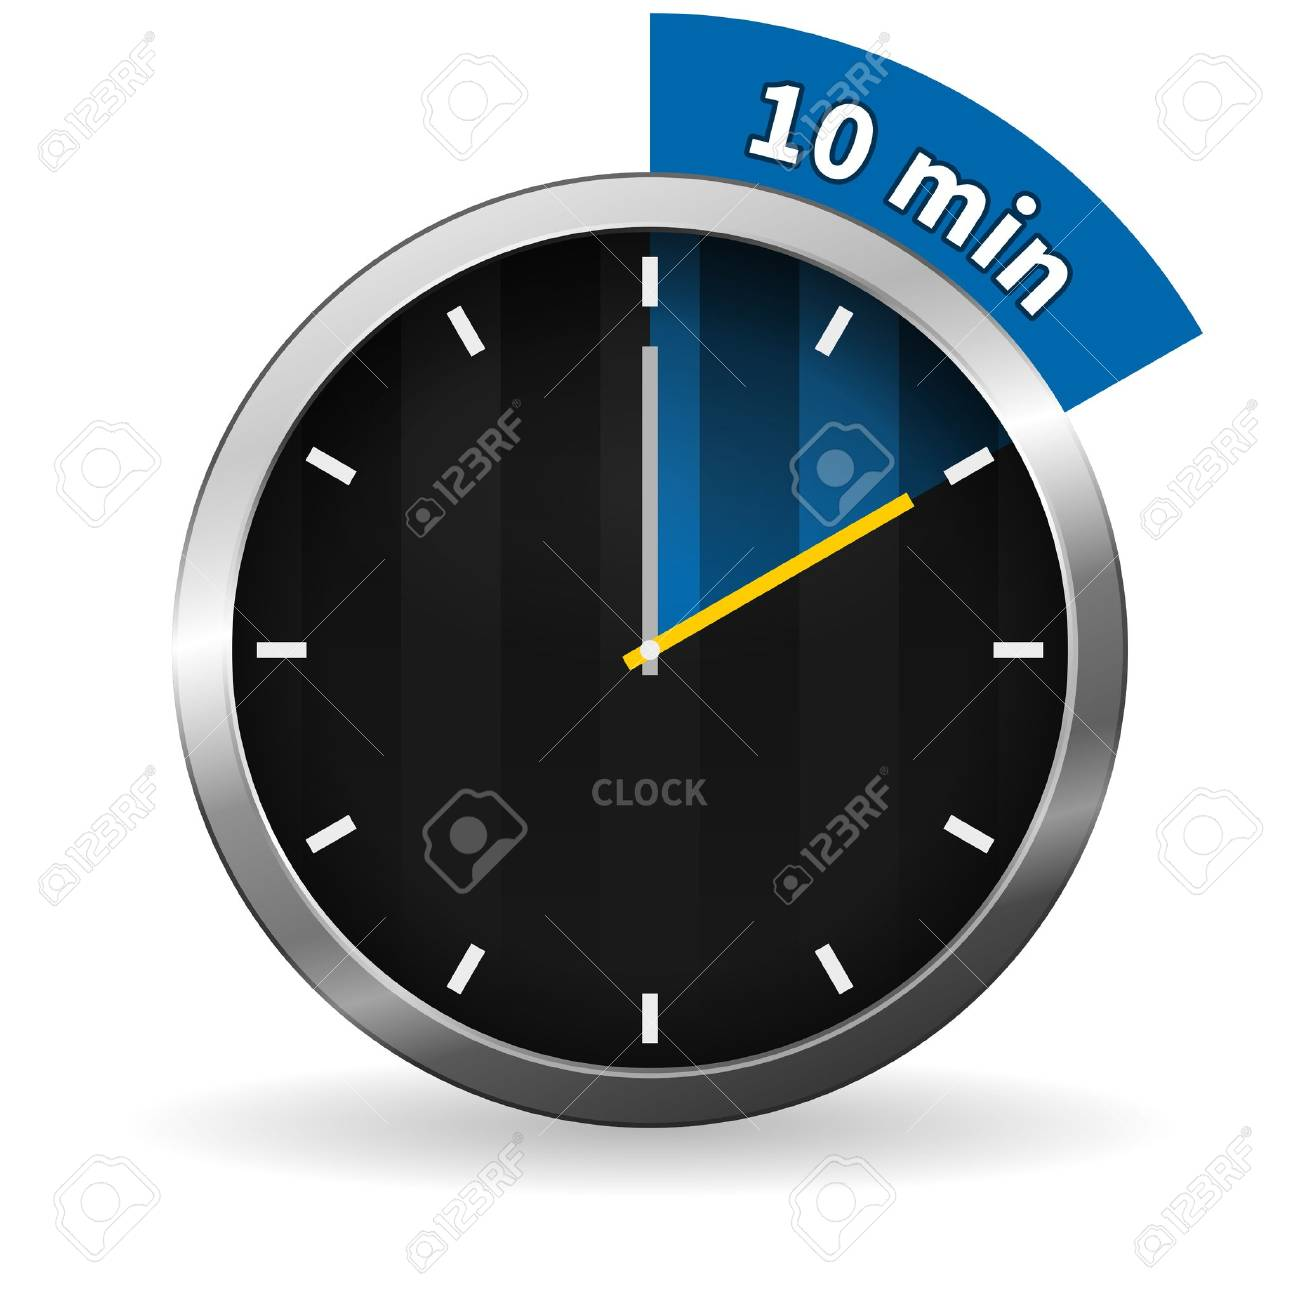 Clock Showing 10 O'clock Clock 10 Minutes to go Clock